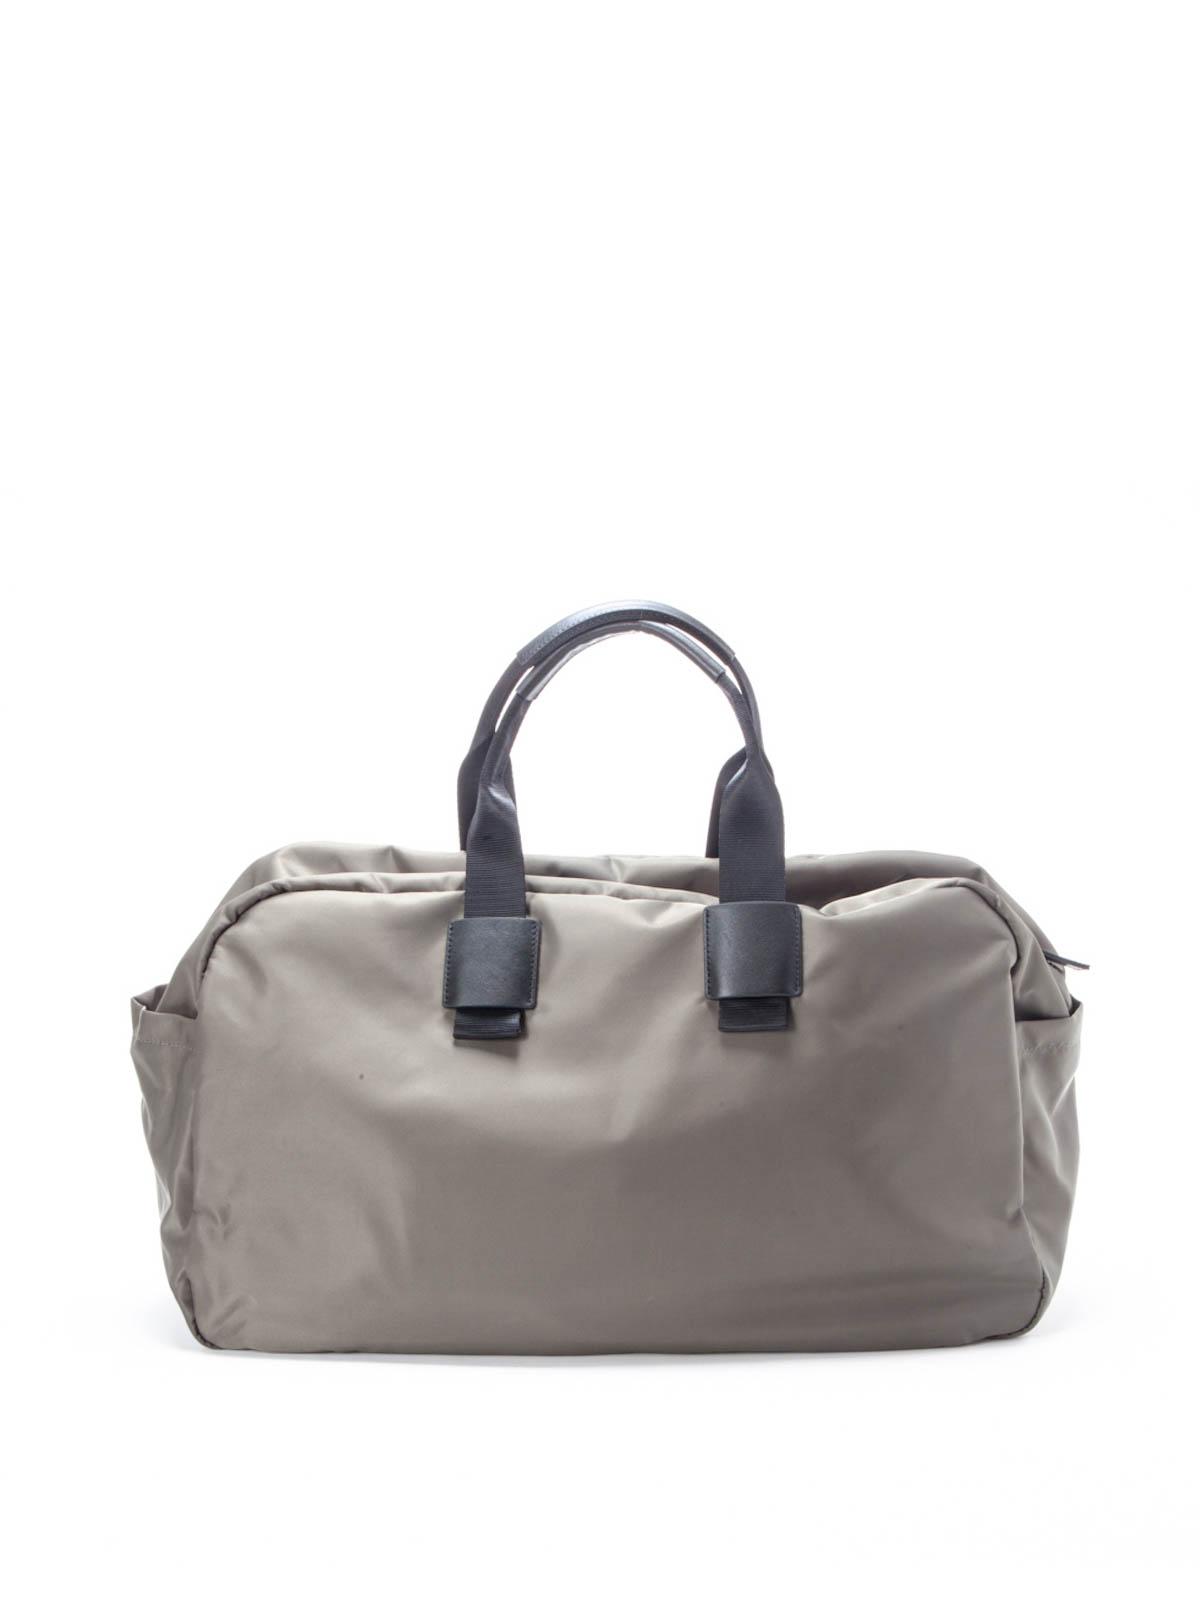 4f59e88b506c Dsquared2 - Antony duffel bag - sport bags - DF1199 117 5141